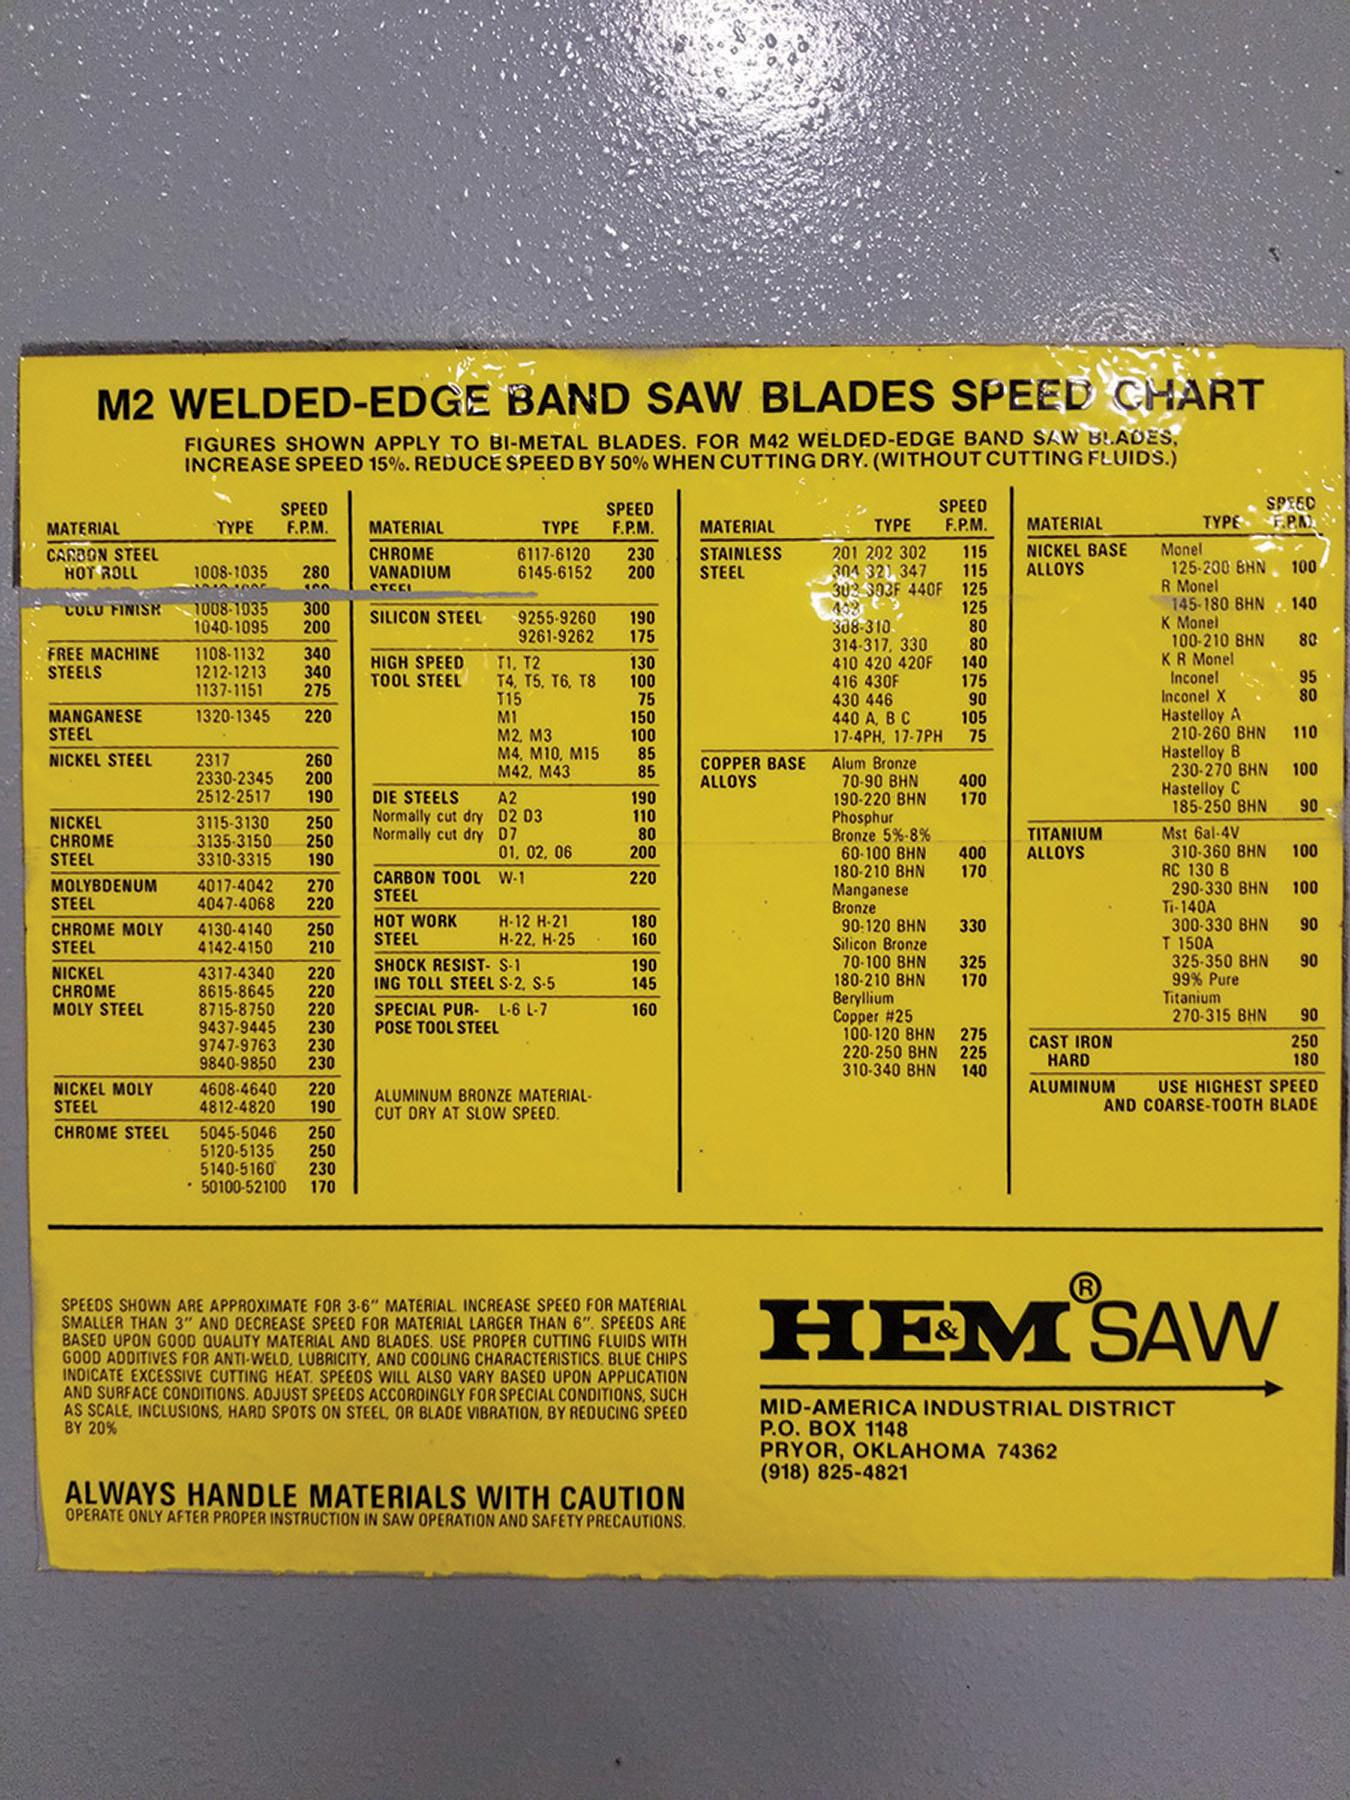 Lot 2 - 2005 HEM SAW HORIZONTAL BAND SAW, MODEL WF190MRB-DC, S/N 992705N, DRO CONTROL STATION, ROTARY TABLE